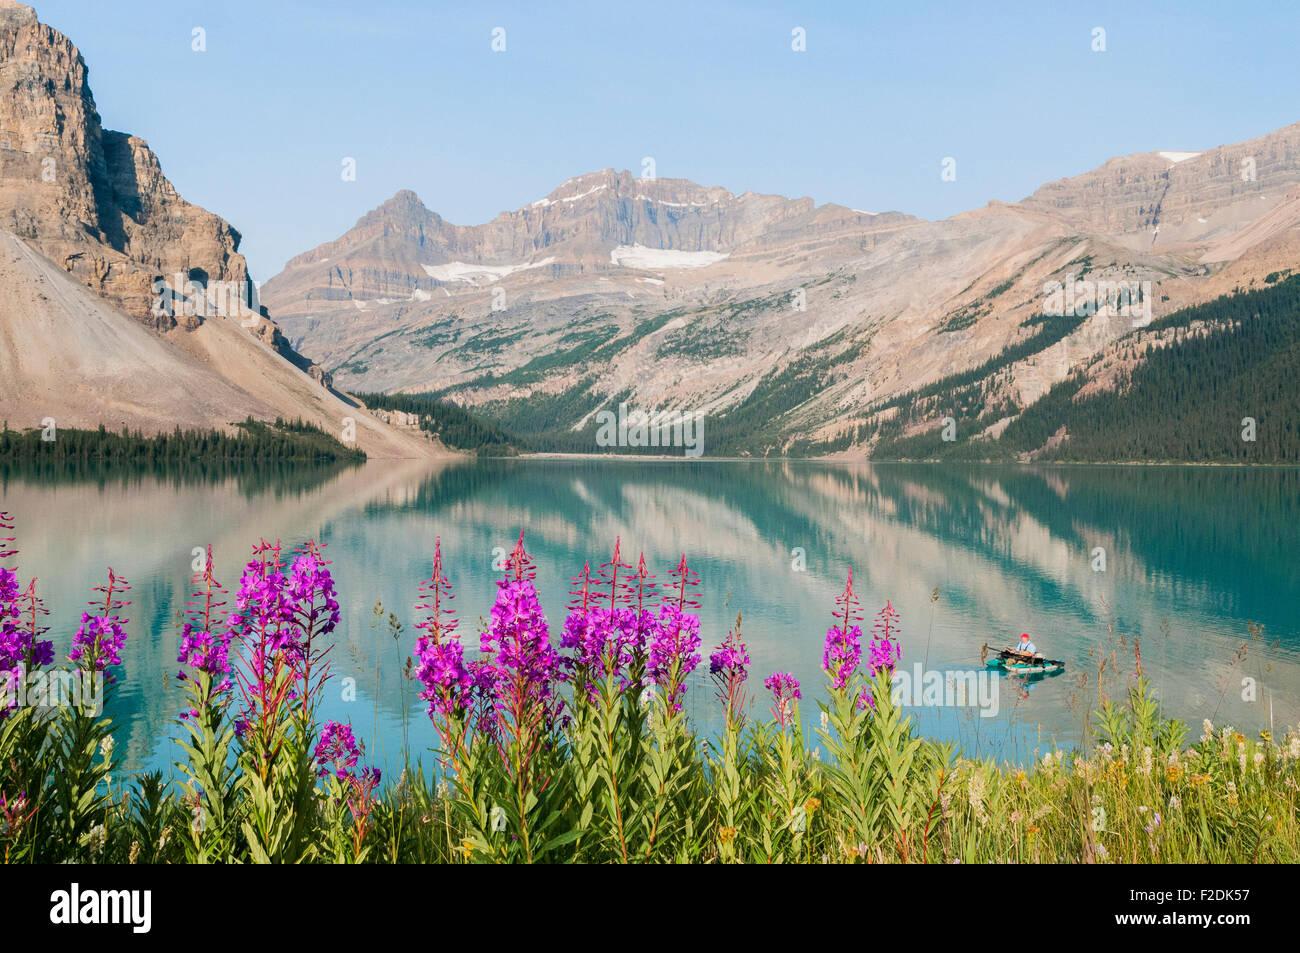 Fisherman, Bow Lake, Banff National Park, Alberta, Canada - Stock Image